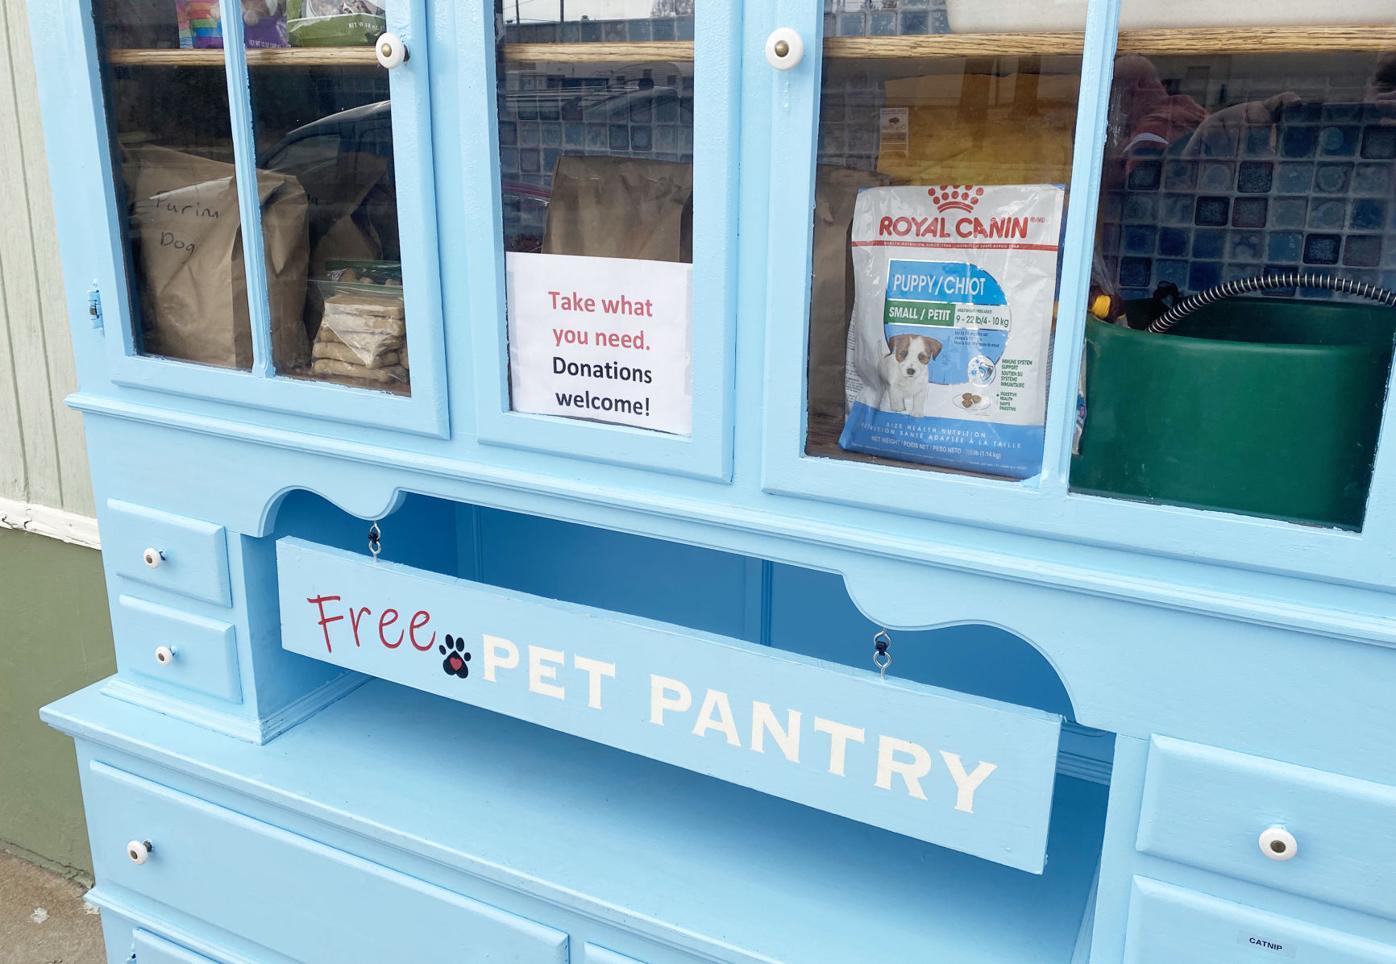 Free Little Pet Pantry